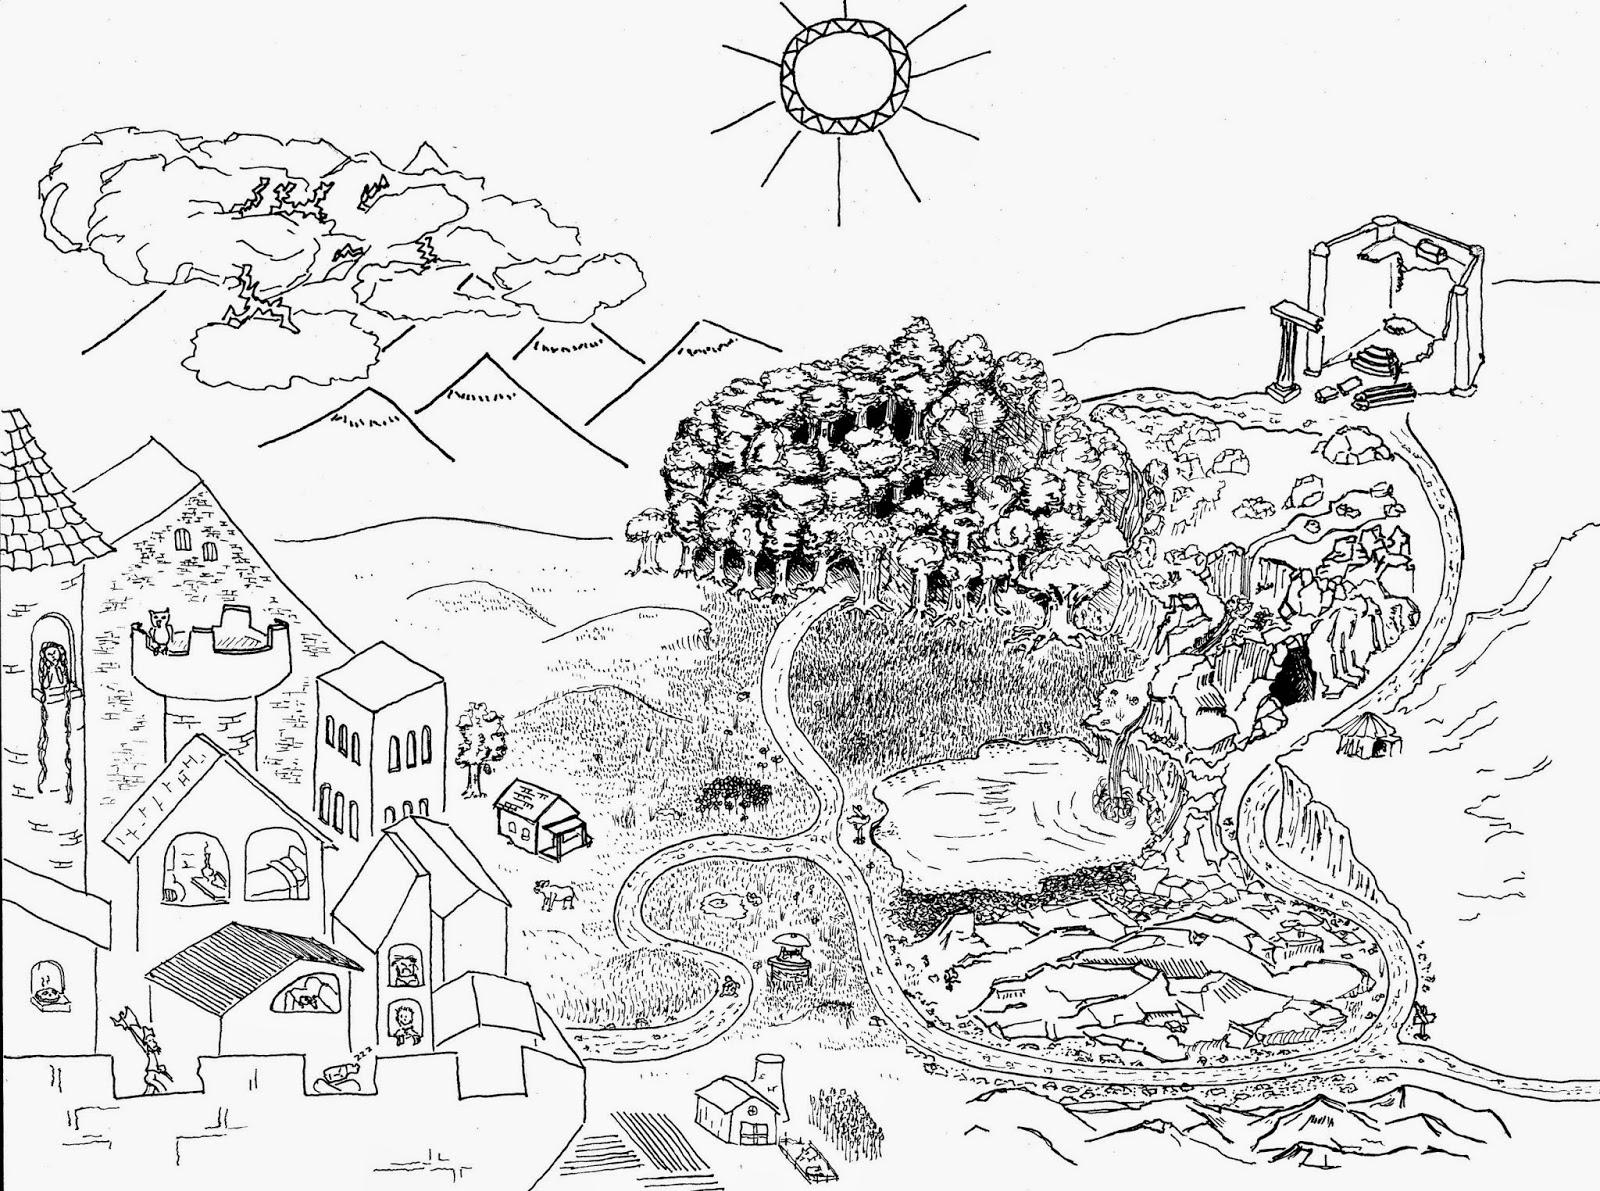 Hack & Slash: On a Children's Quest, A Starter 5e Adventure